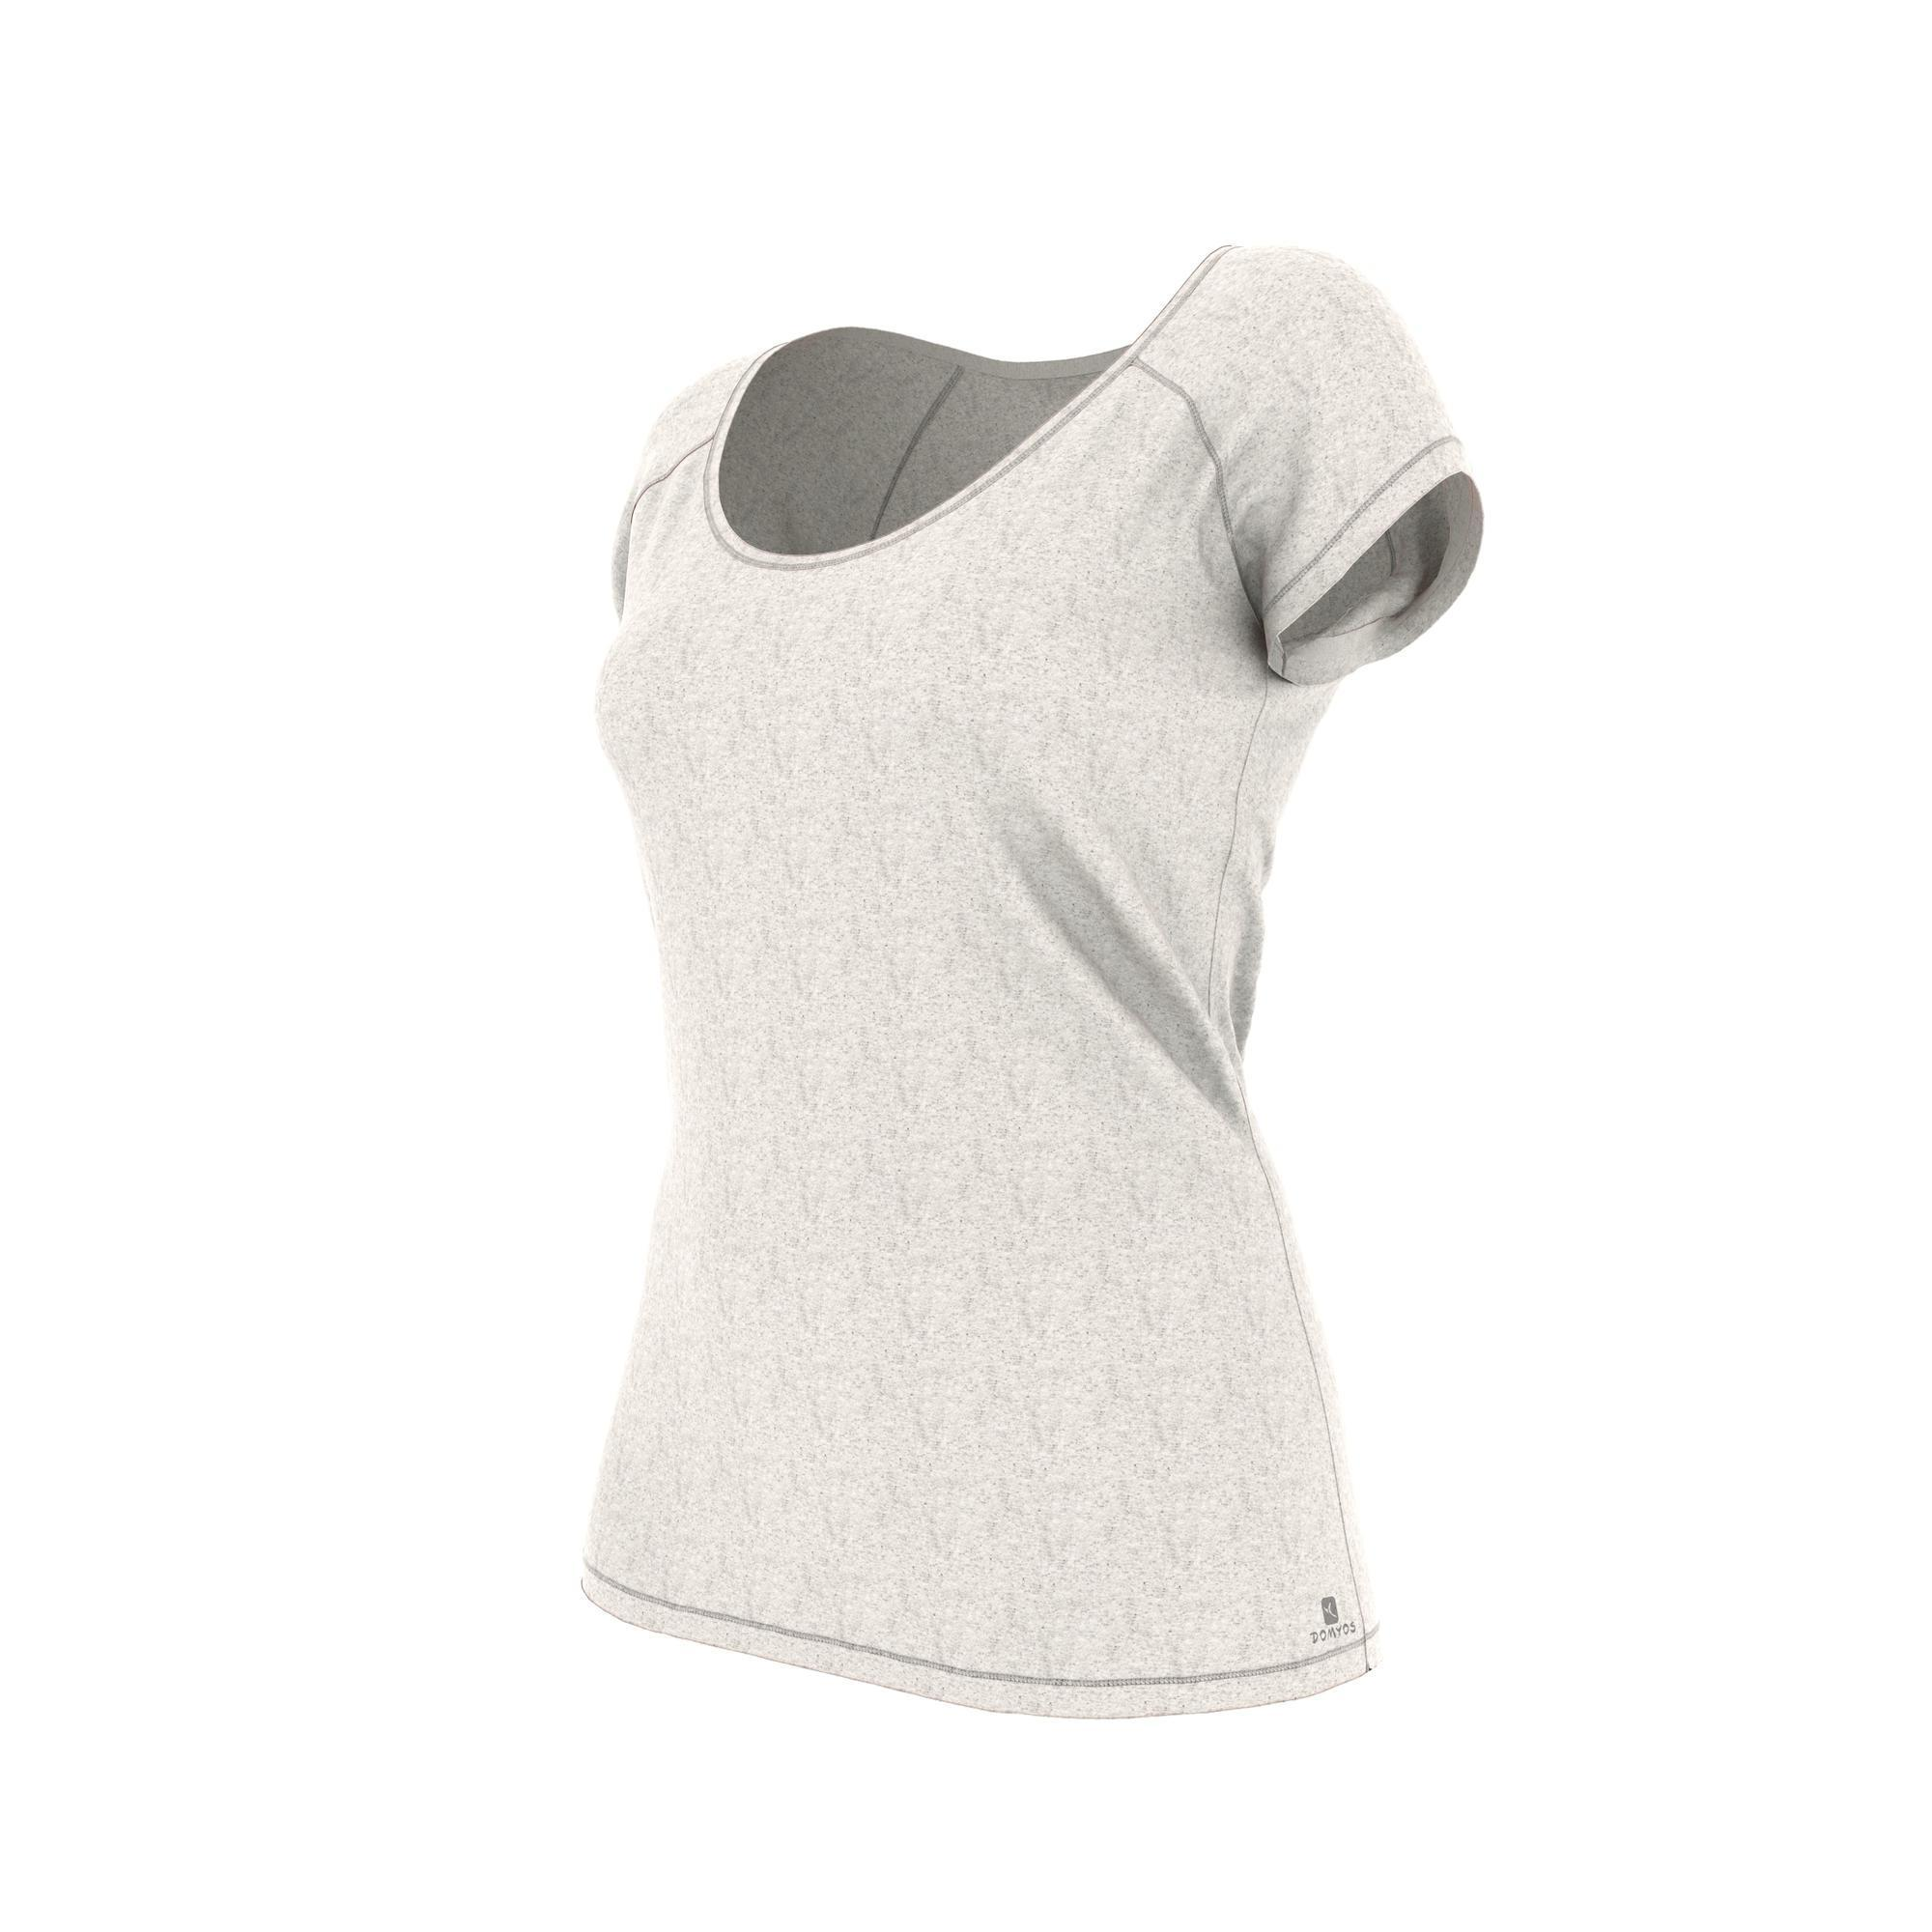 Domyos Dames T-shirt 500 voor gym en pilates slim fit beige